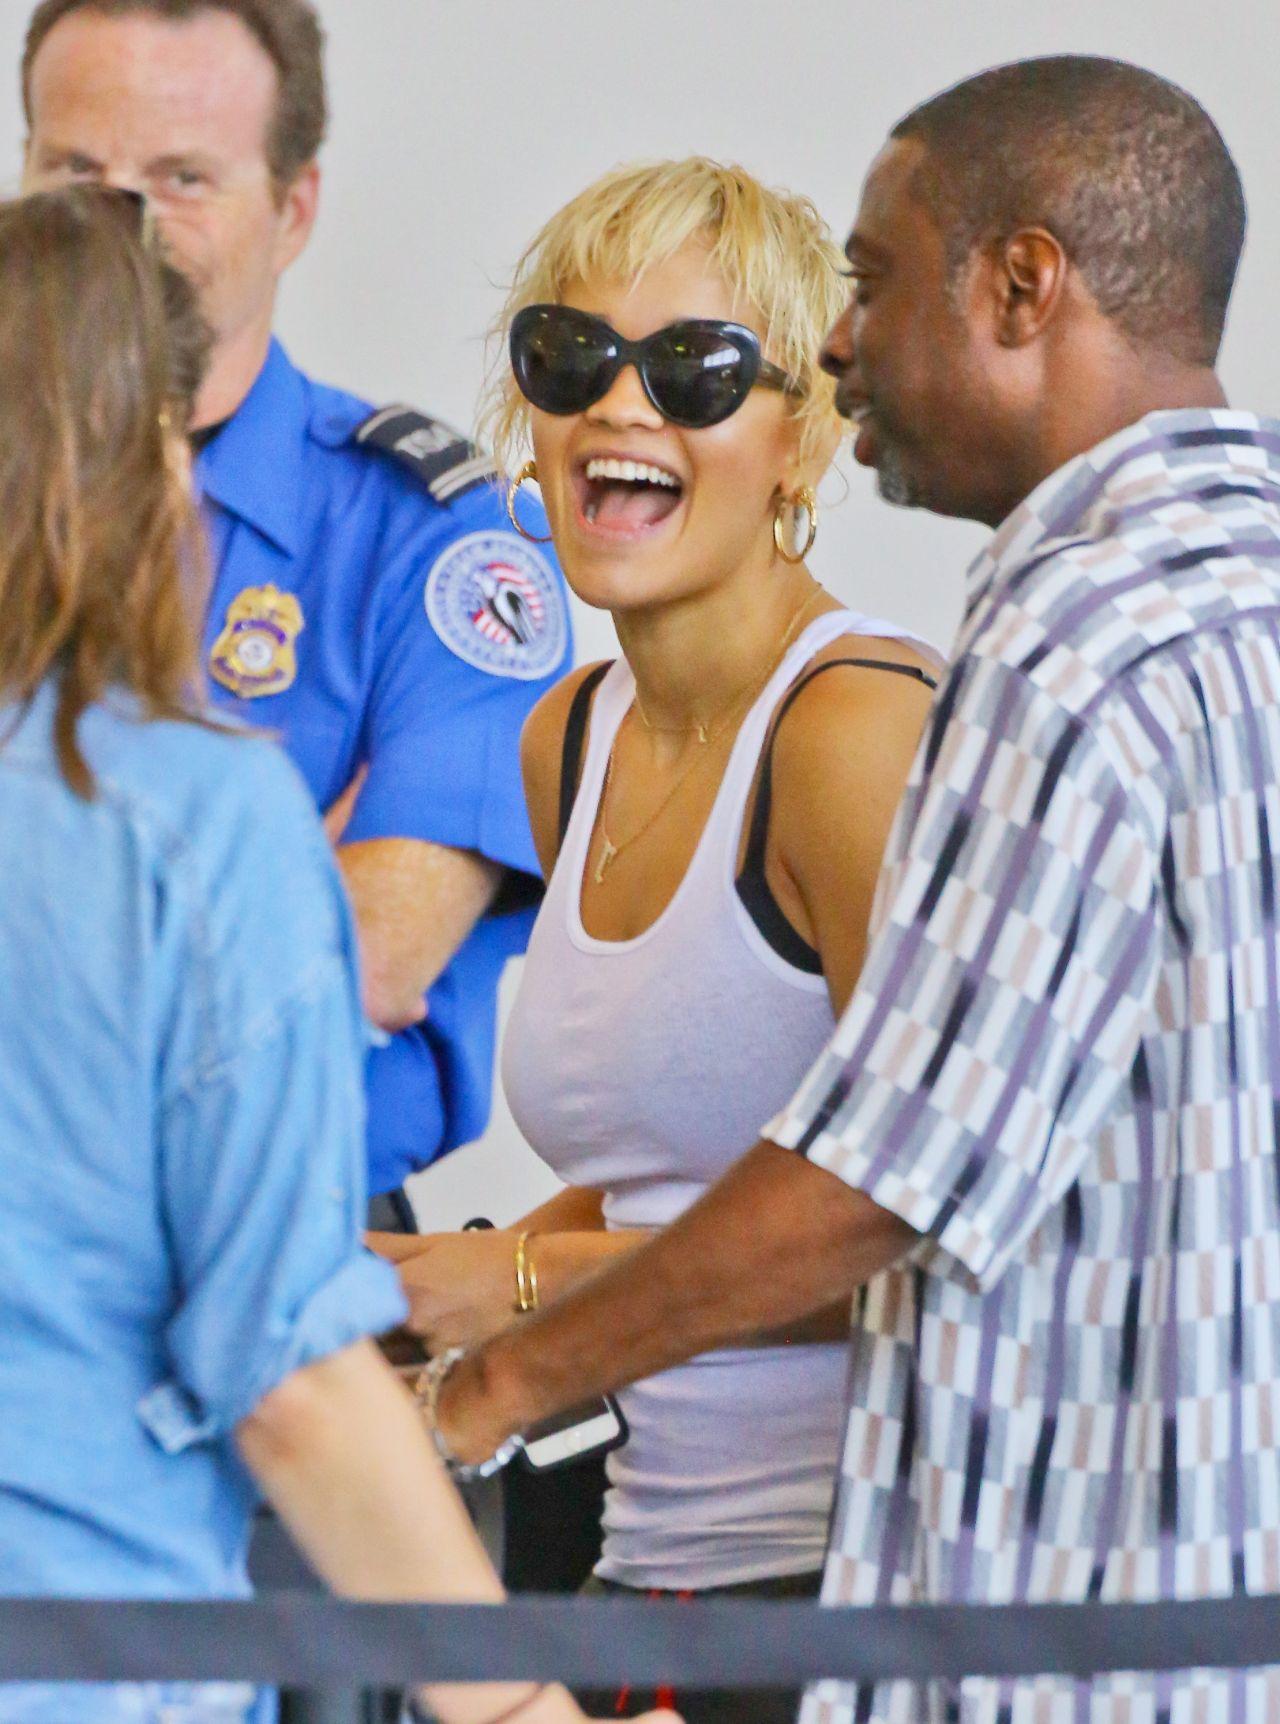 Rita Ora at LAX Airport - September 2014